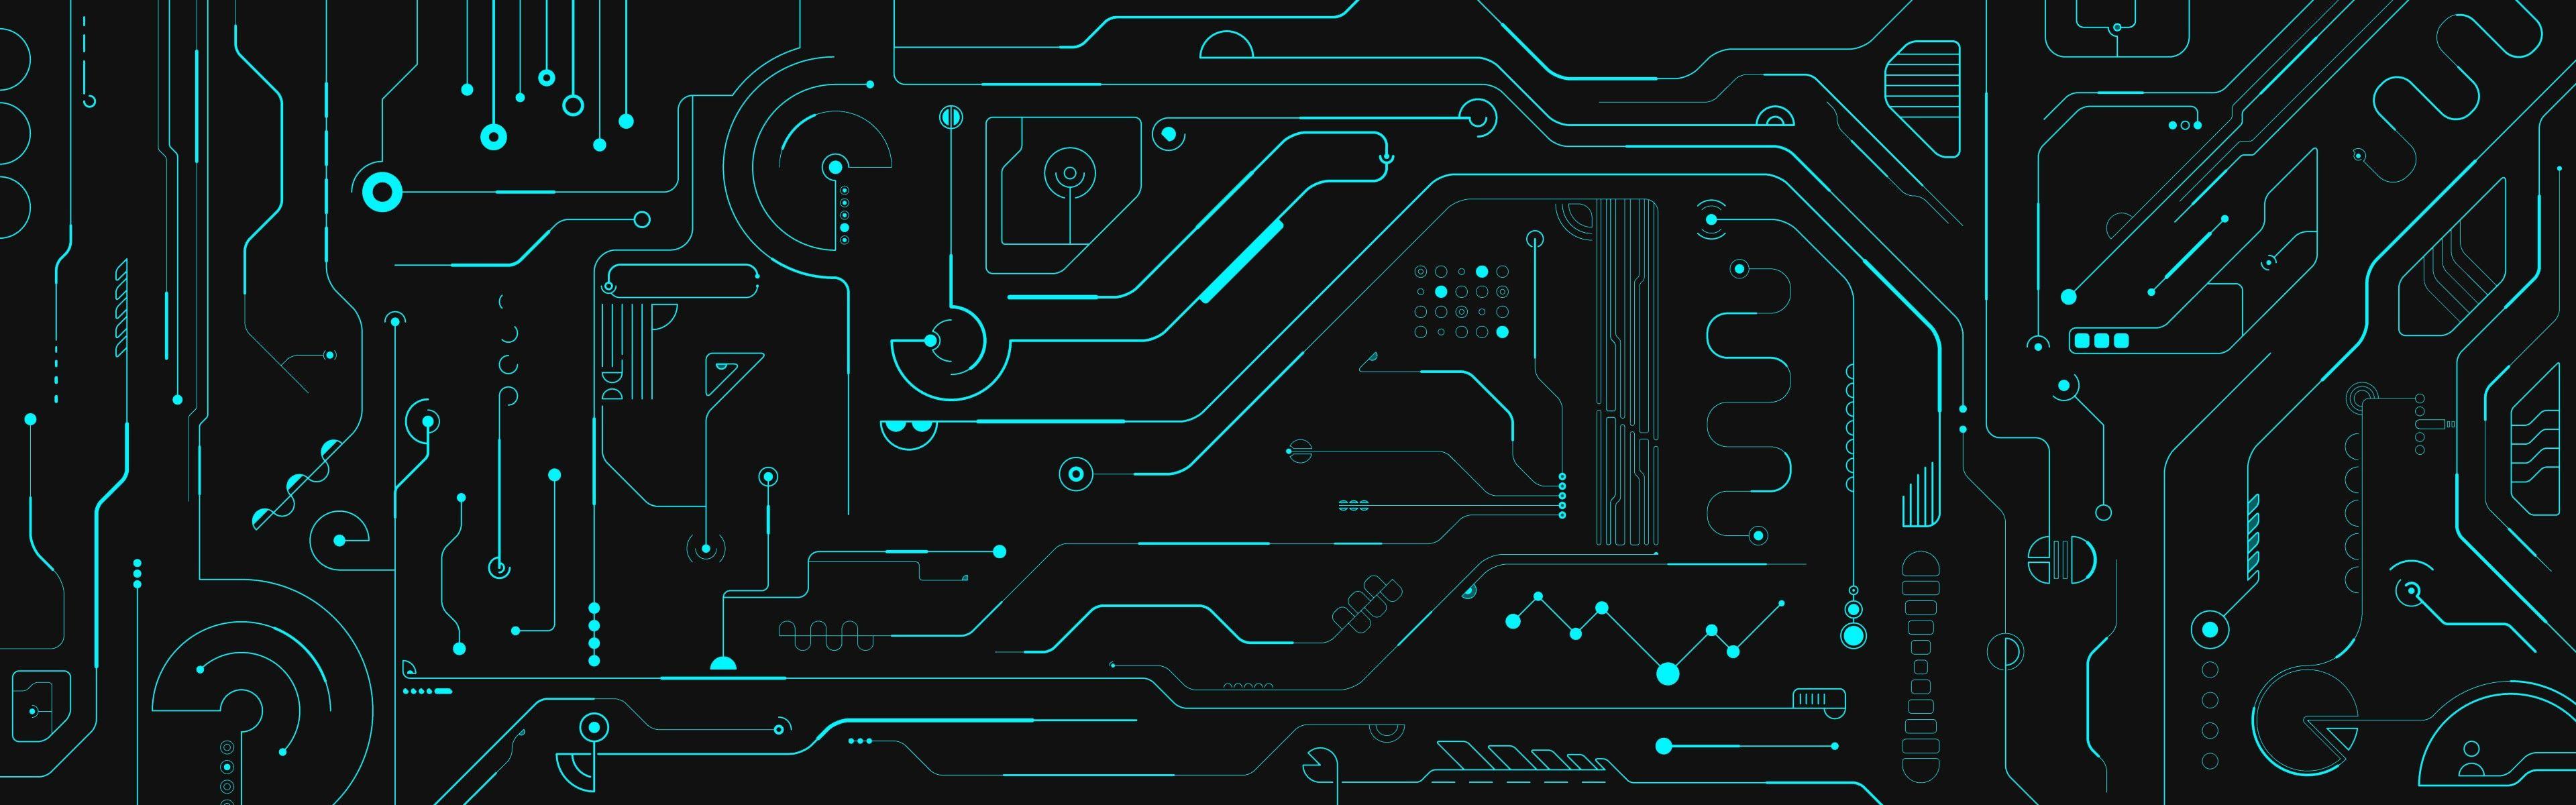 Circuito Hd : Tron legacy hd desktop wallpapers for wallpapers planos de